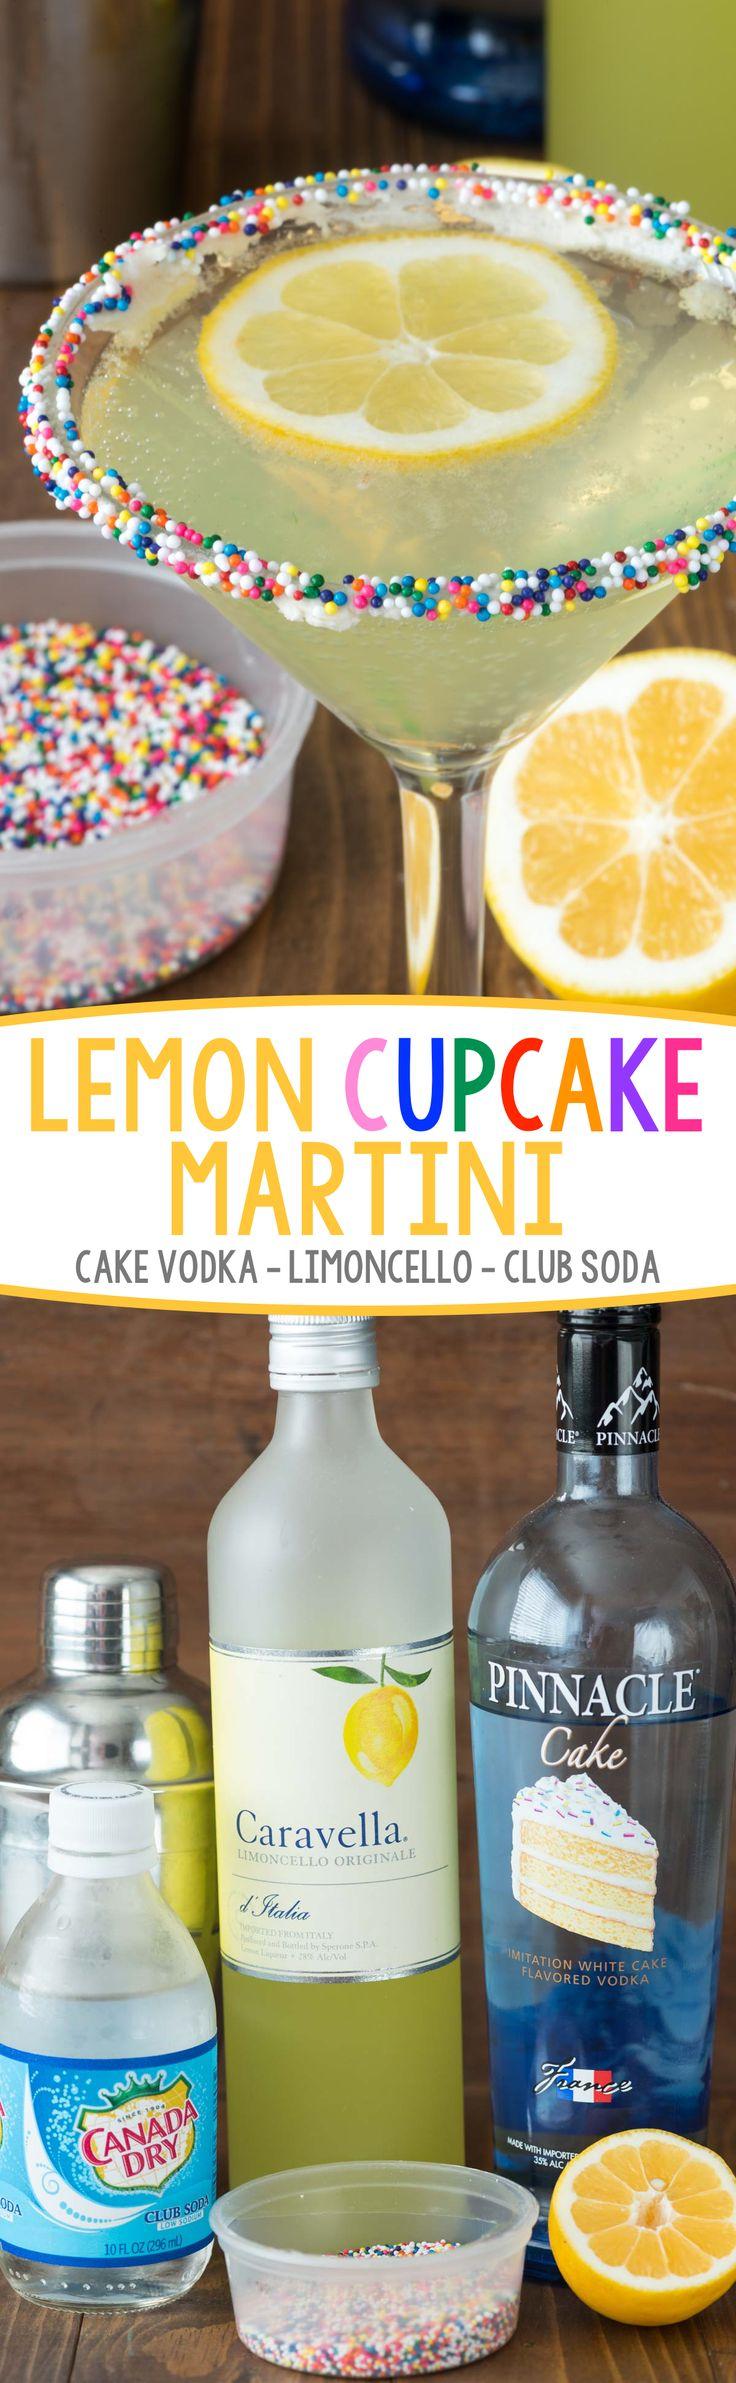 Lemon Cupcake Martini - only 3 ingredients in this easy martini recipe that tastes like a lemon cupcake!